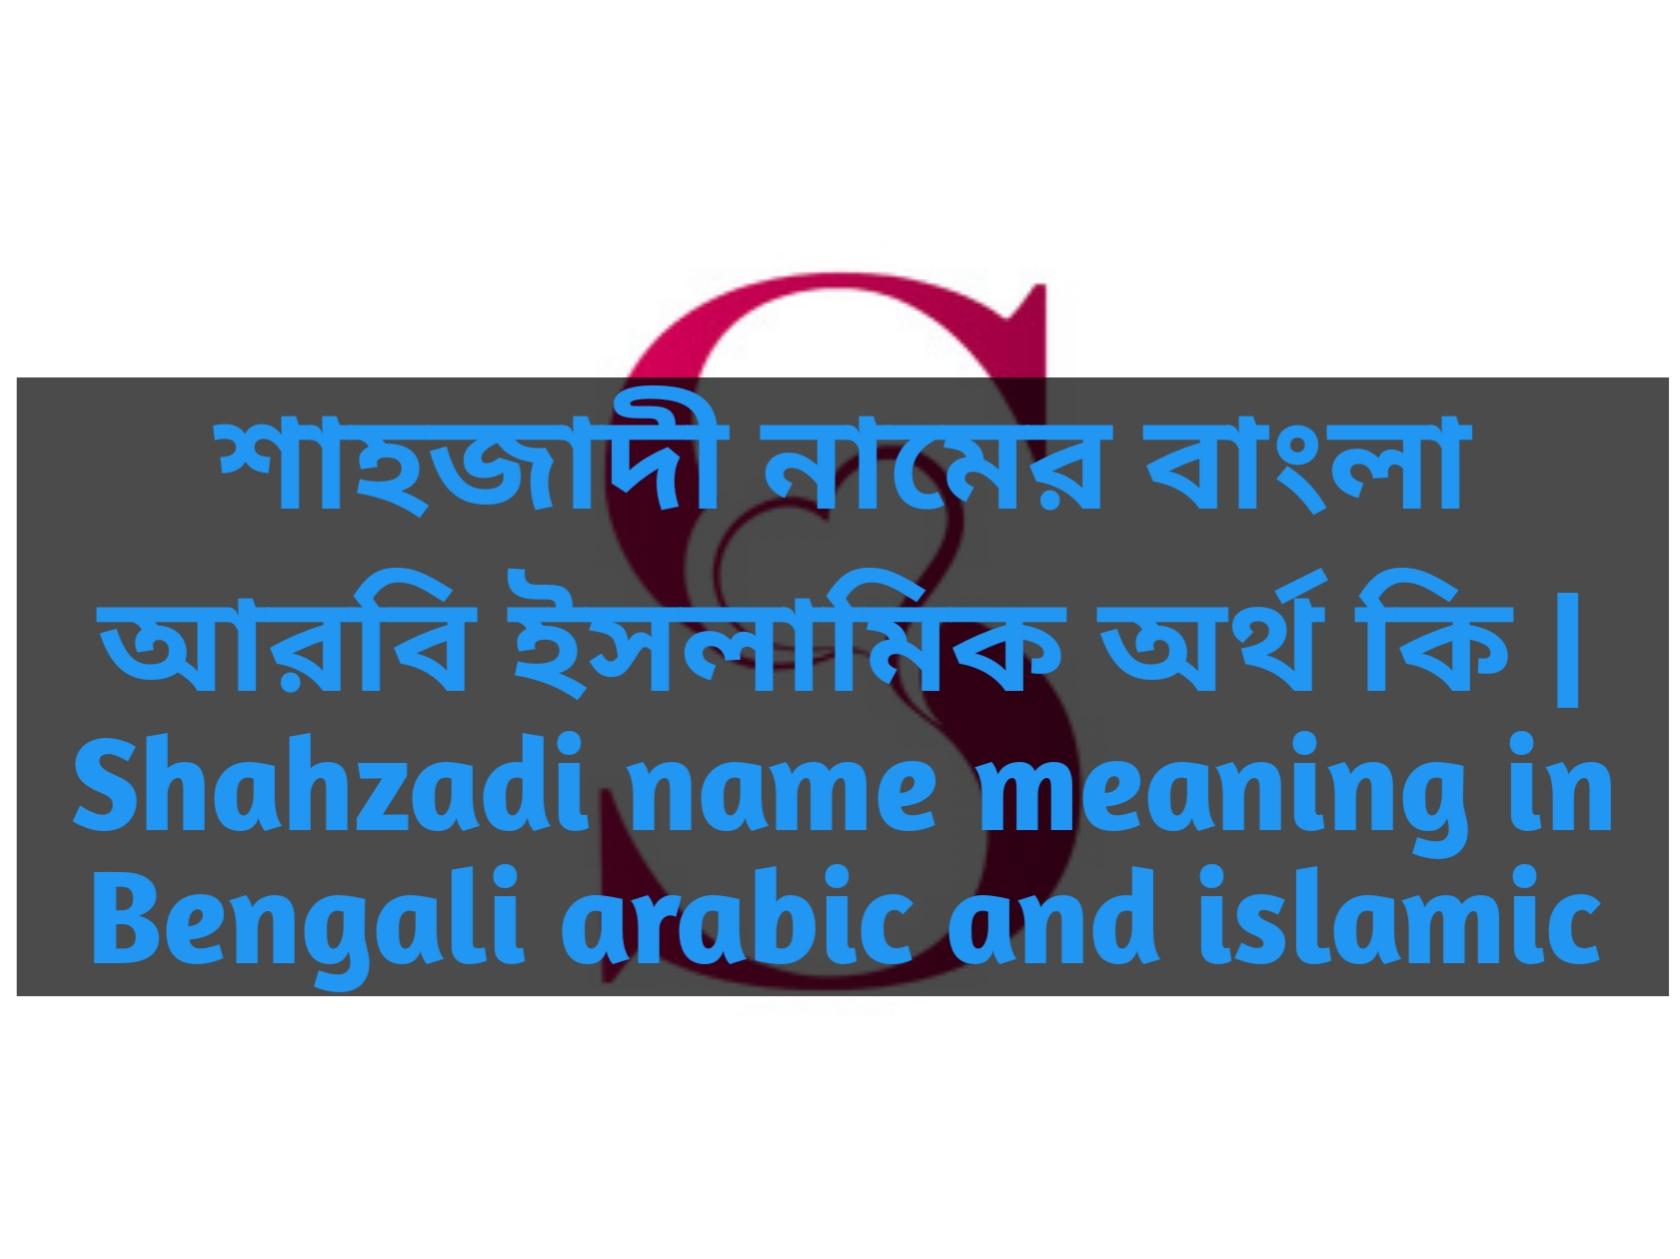 Shahzadi name meaning in Bengali, শাহজাদী নামের অর্থ কি, শাহজাদী নামের বাংলা অর্থ কি, শাহজাদী নামের ইসলামিক অর্থ কি,